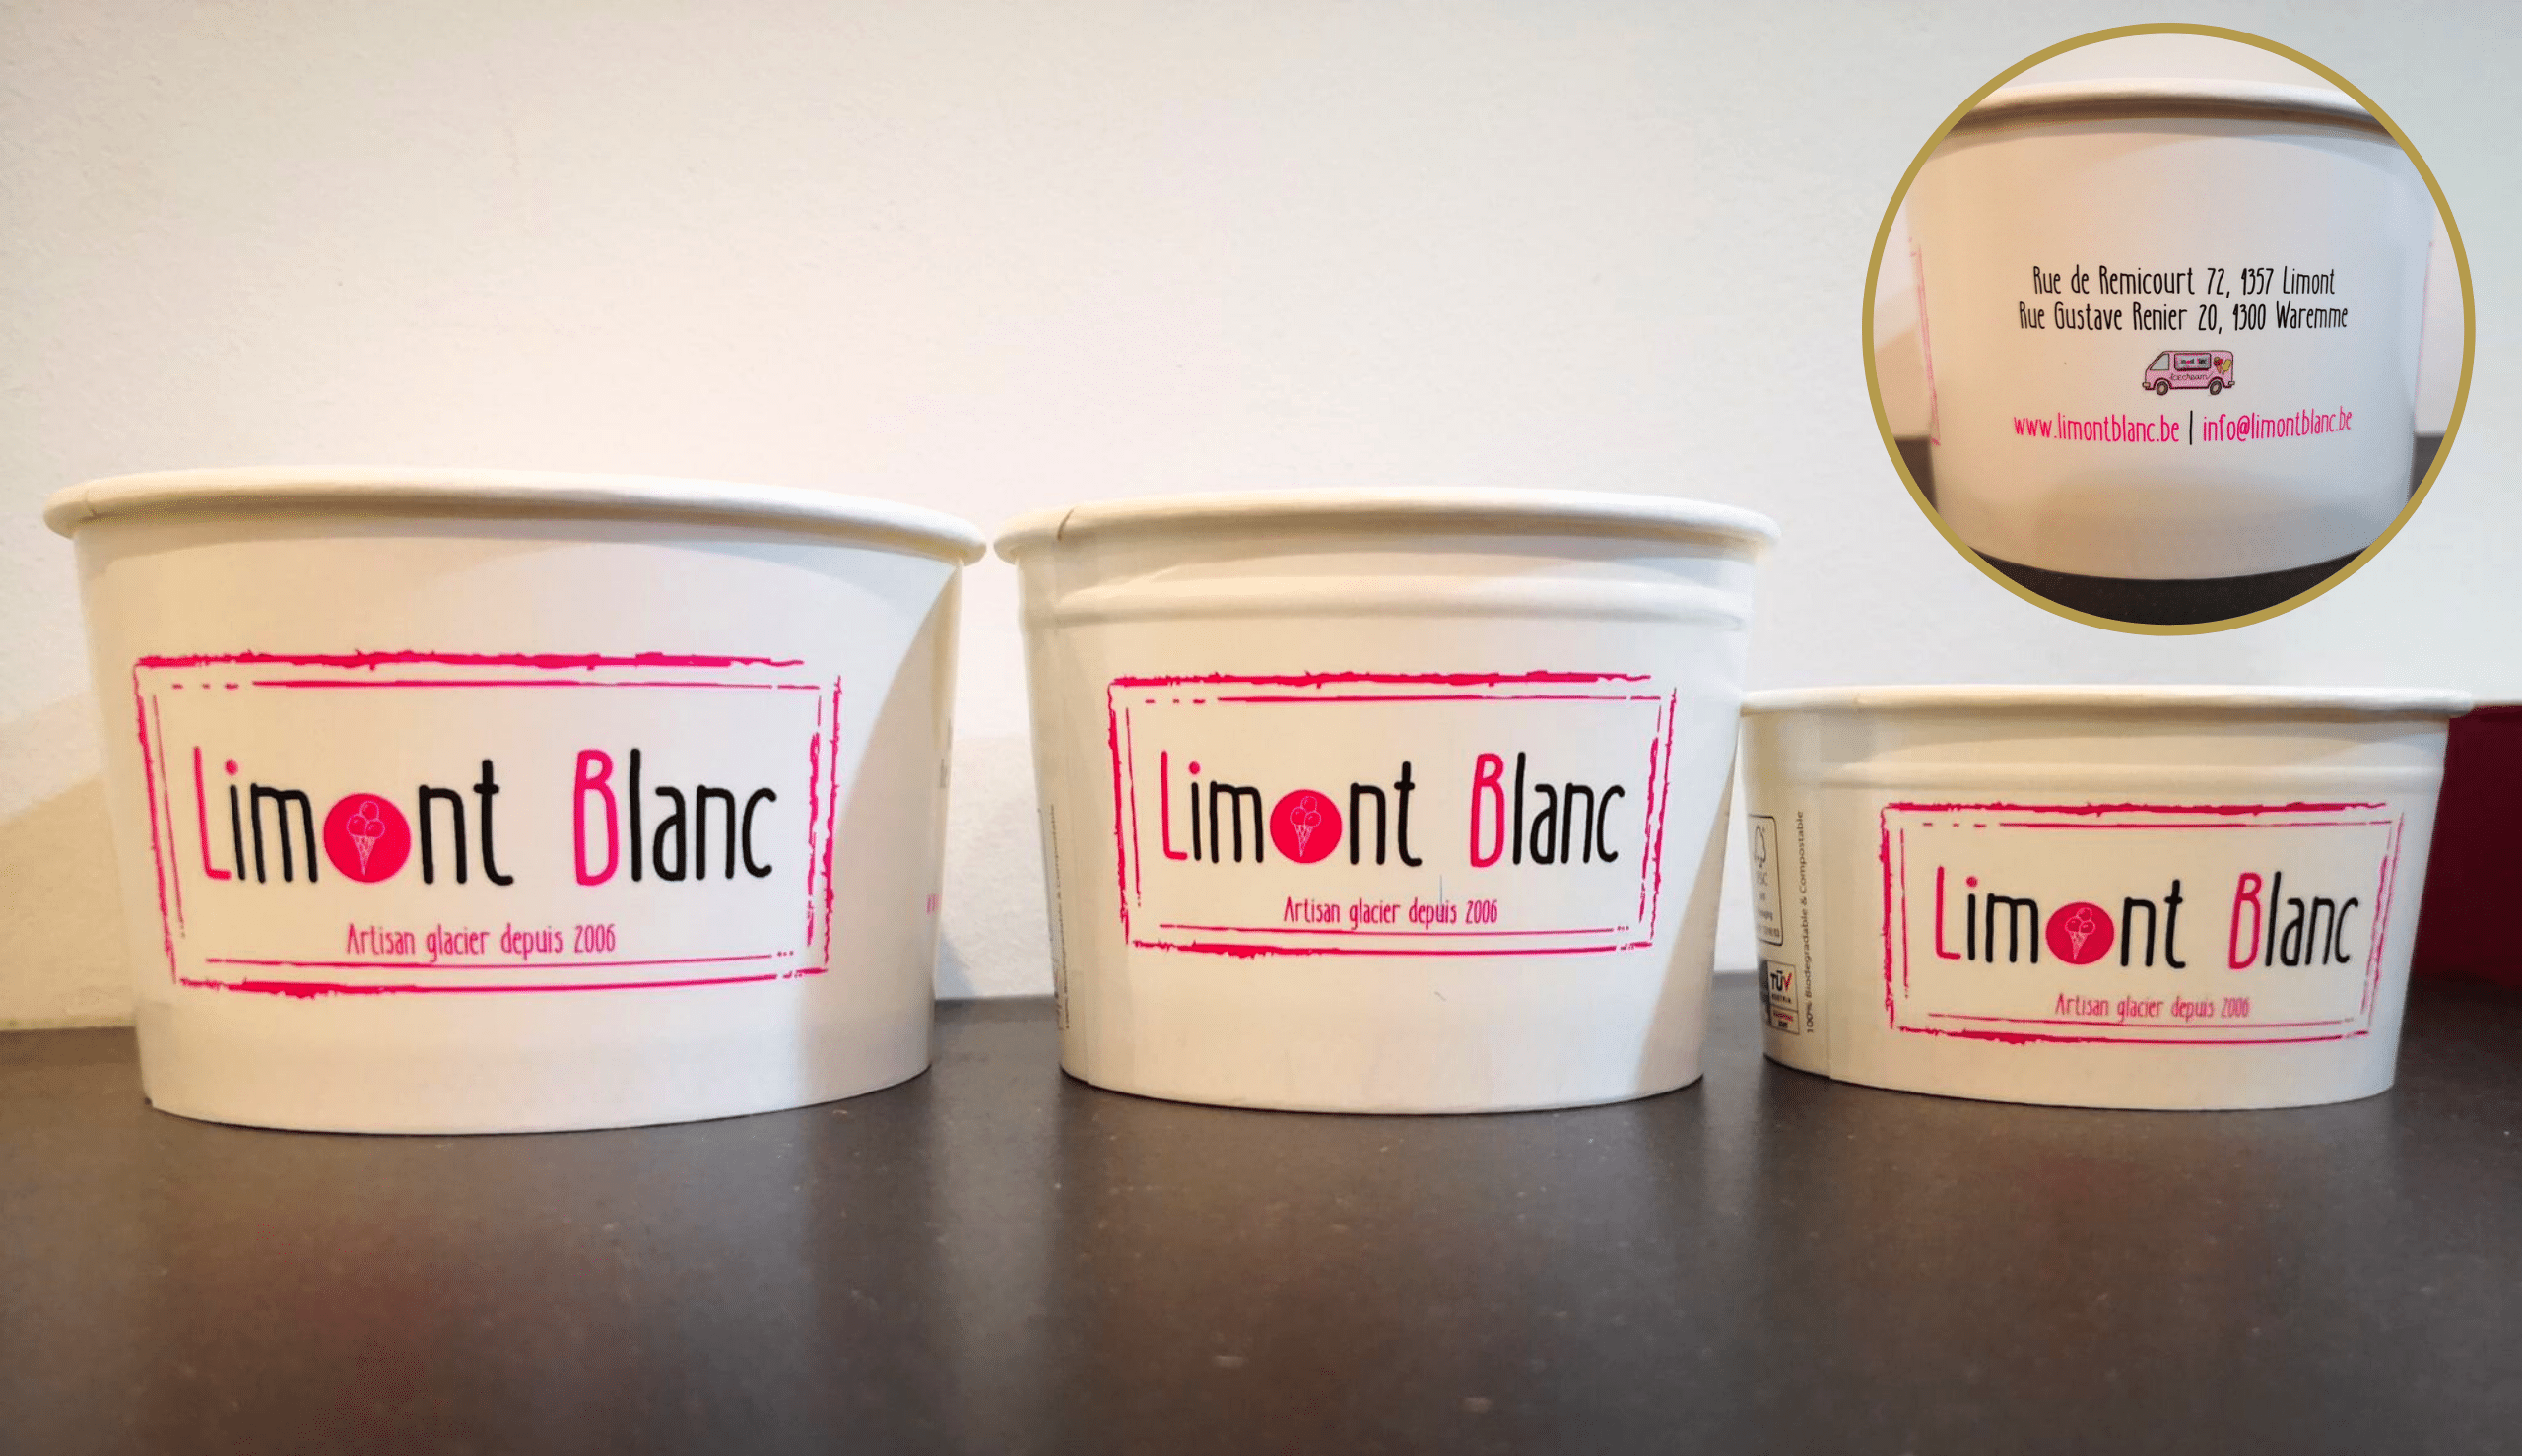 Limont Blanc Waremme